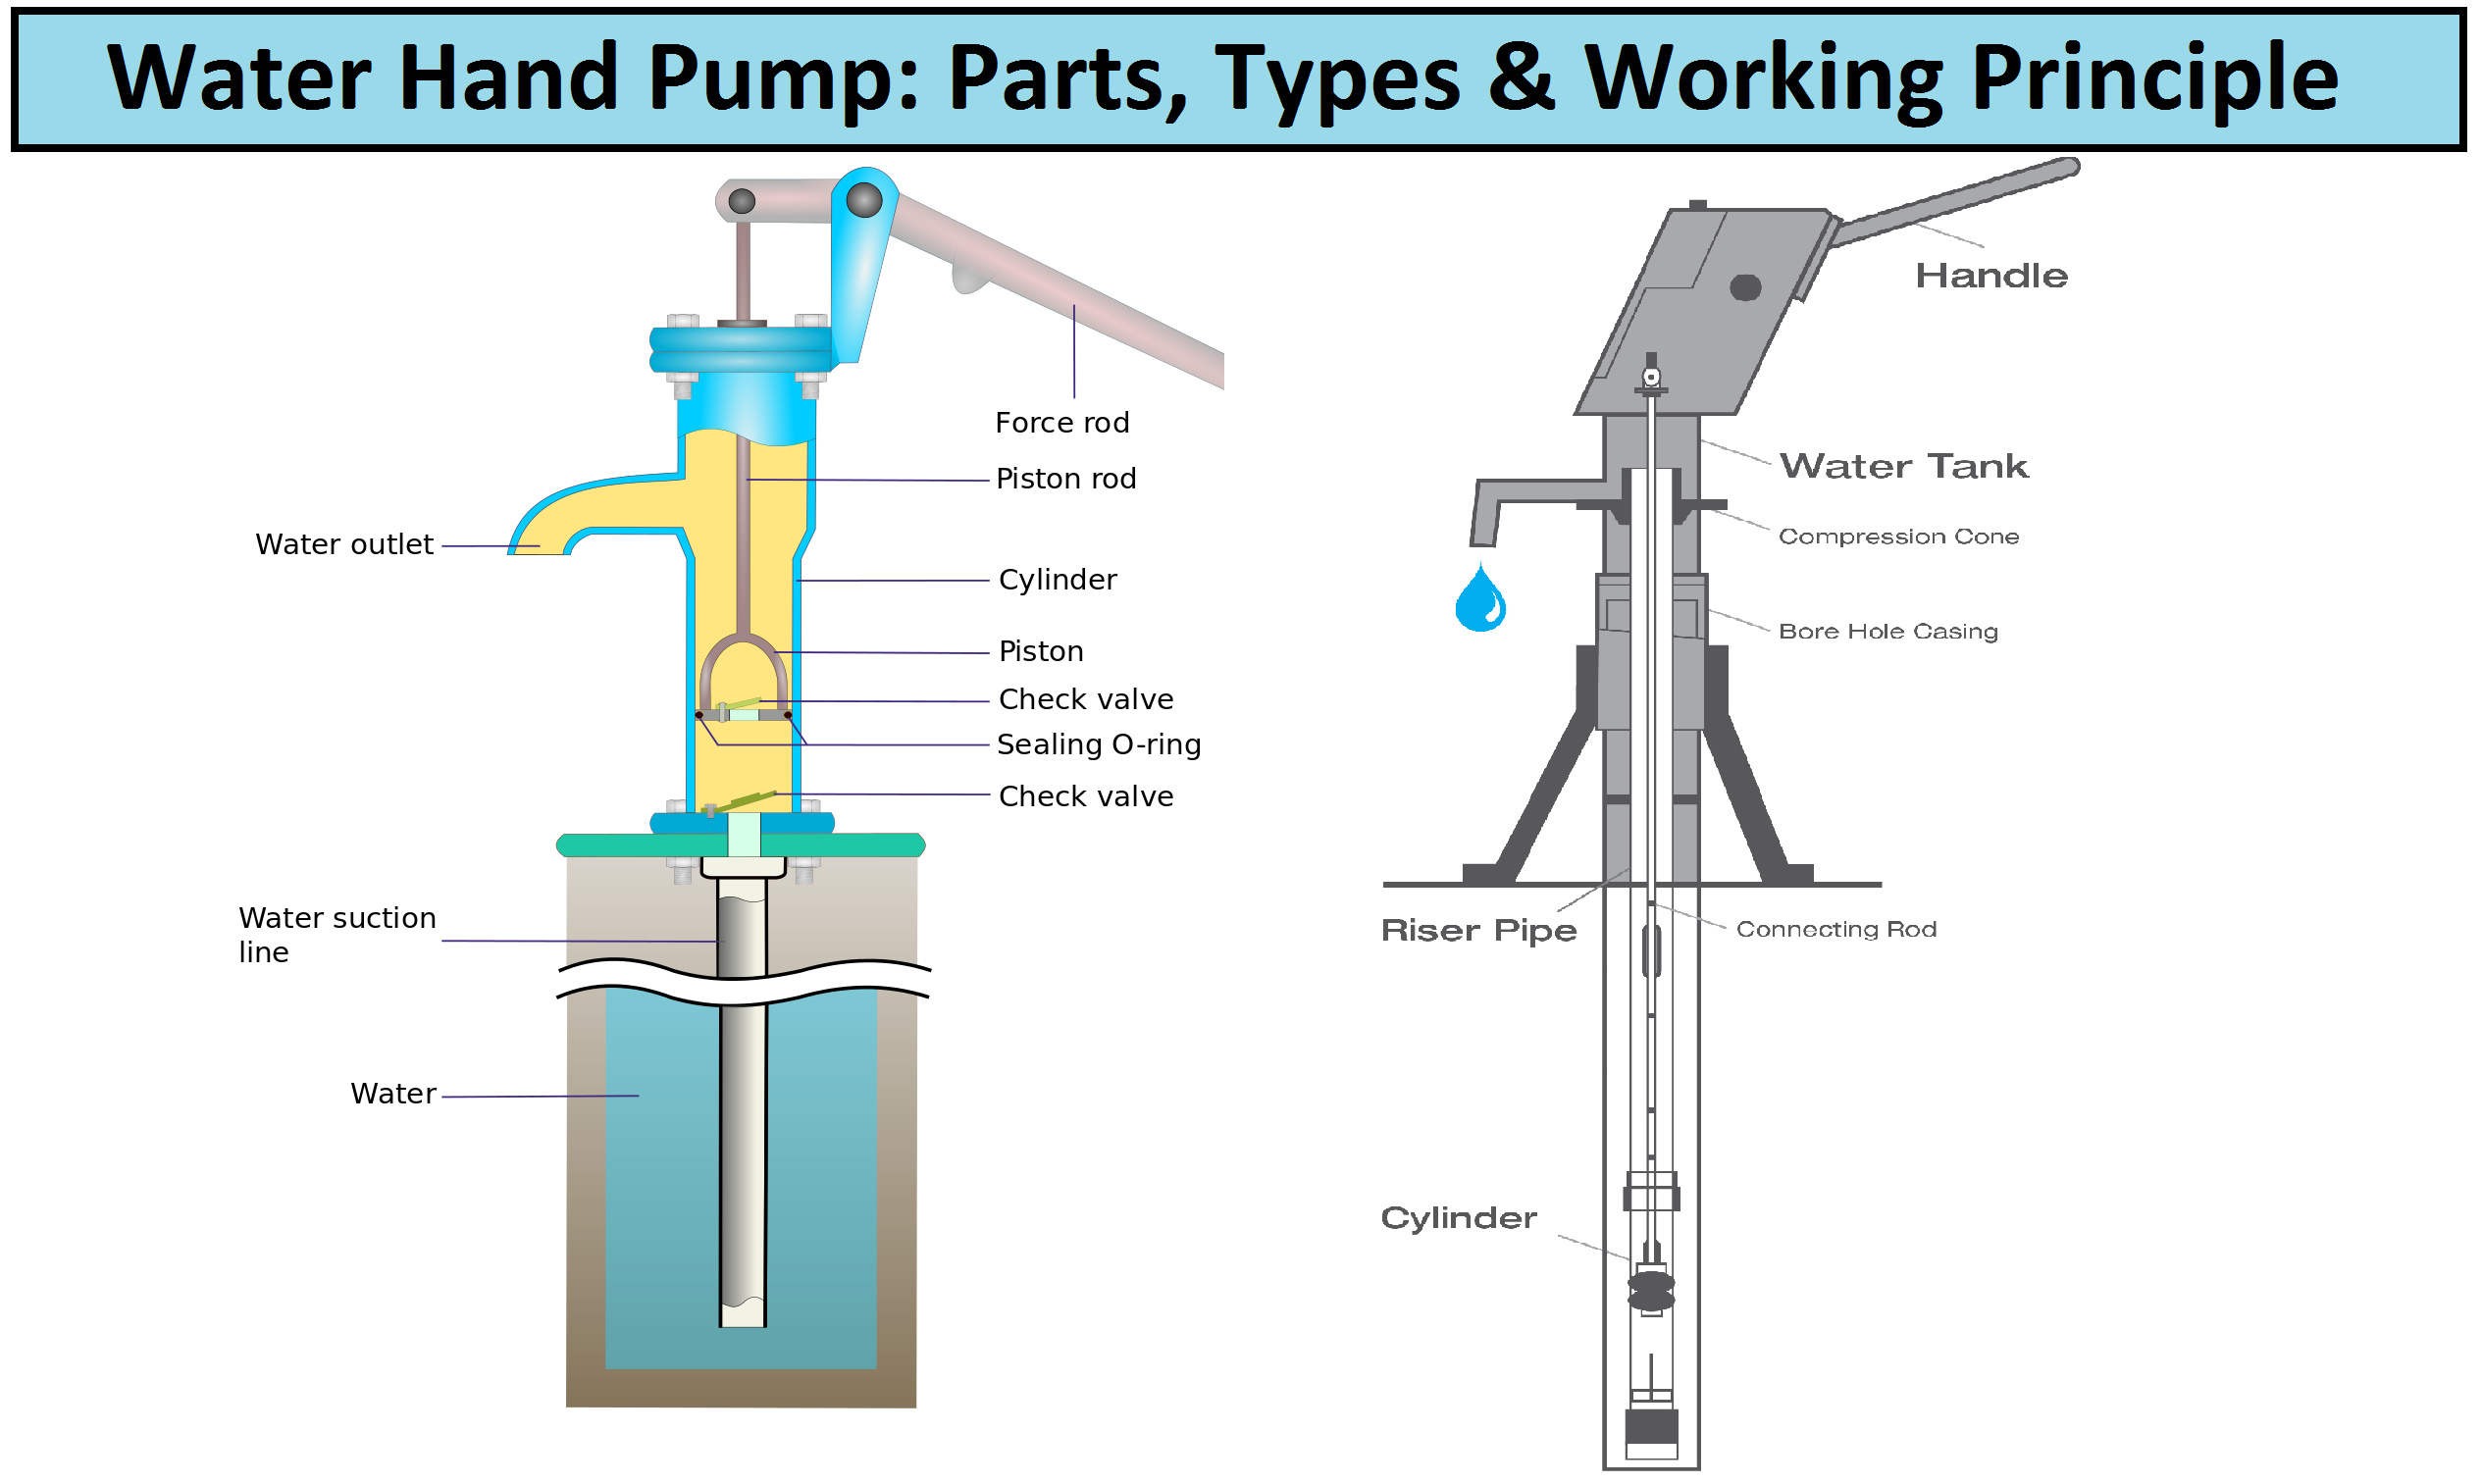 Water Hand Pump Parts Types In 2020 Hand Water Pump Hand Pump Pumps